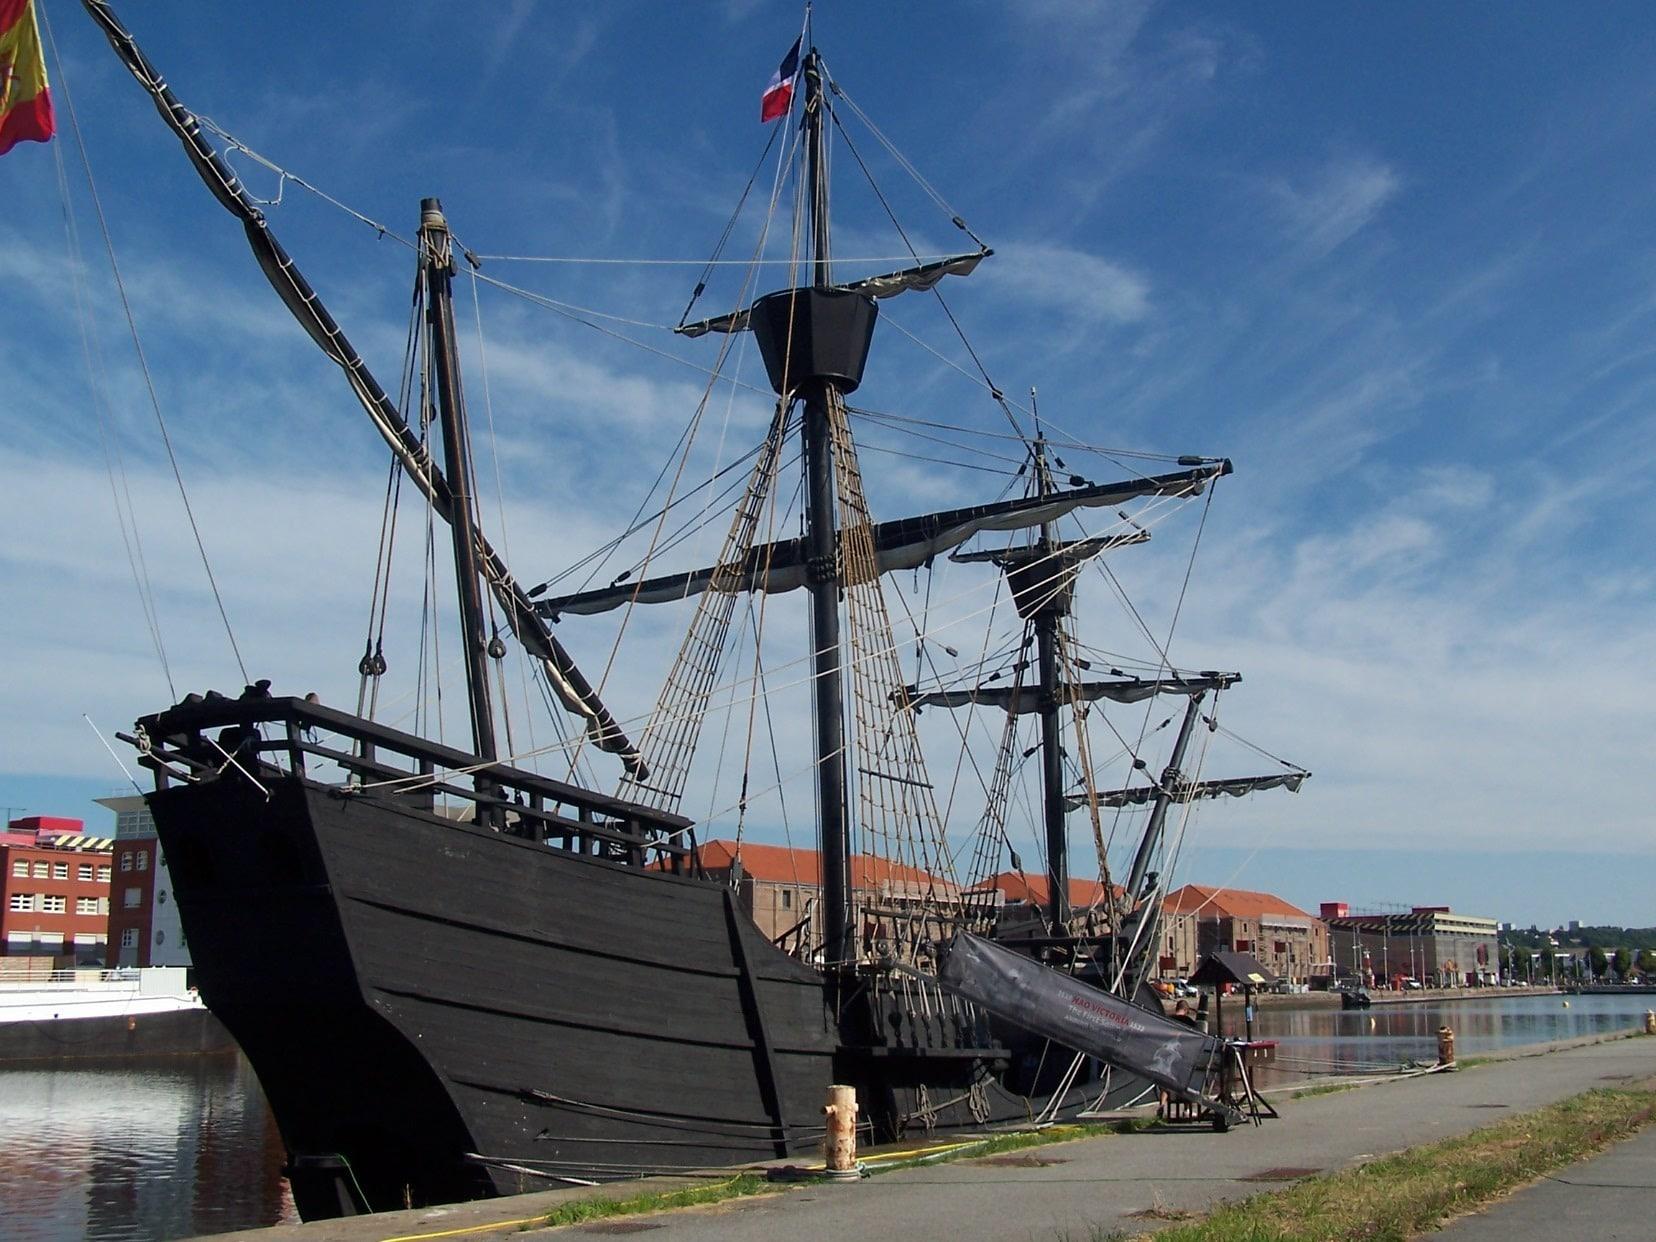 Magellan 's ship Nao-Victoria-stern view